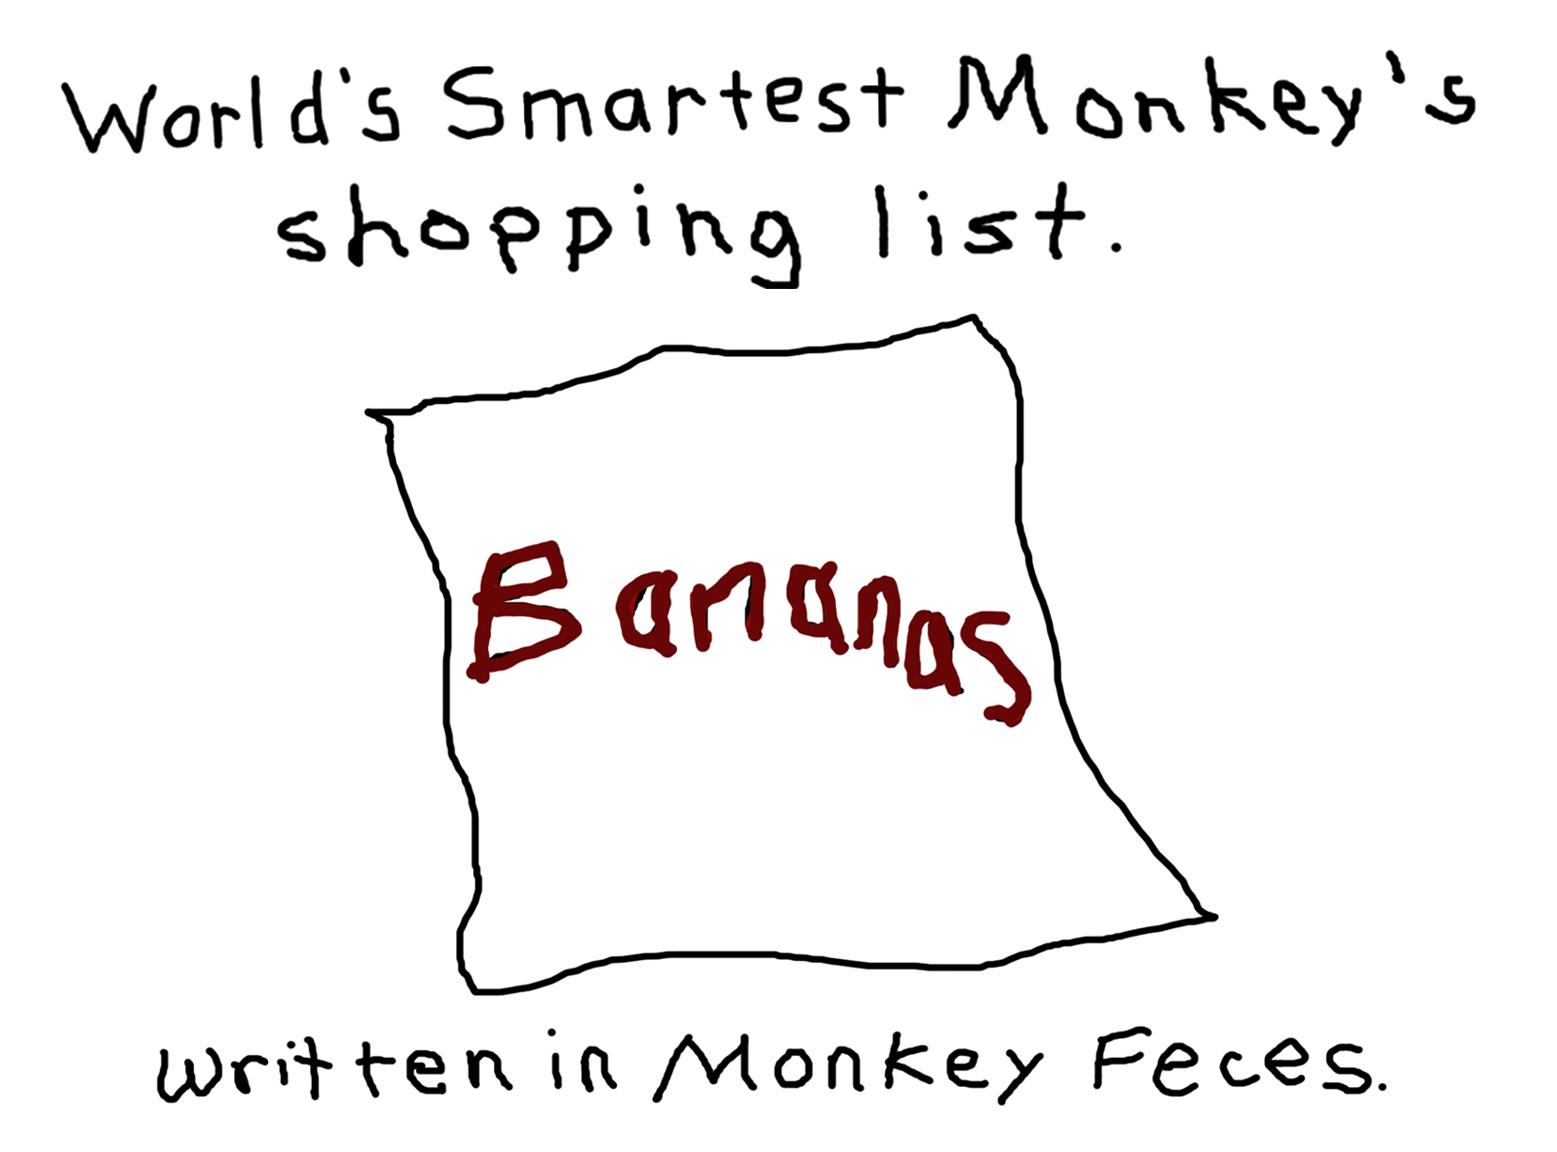 Monkey's Shopping List.